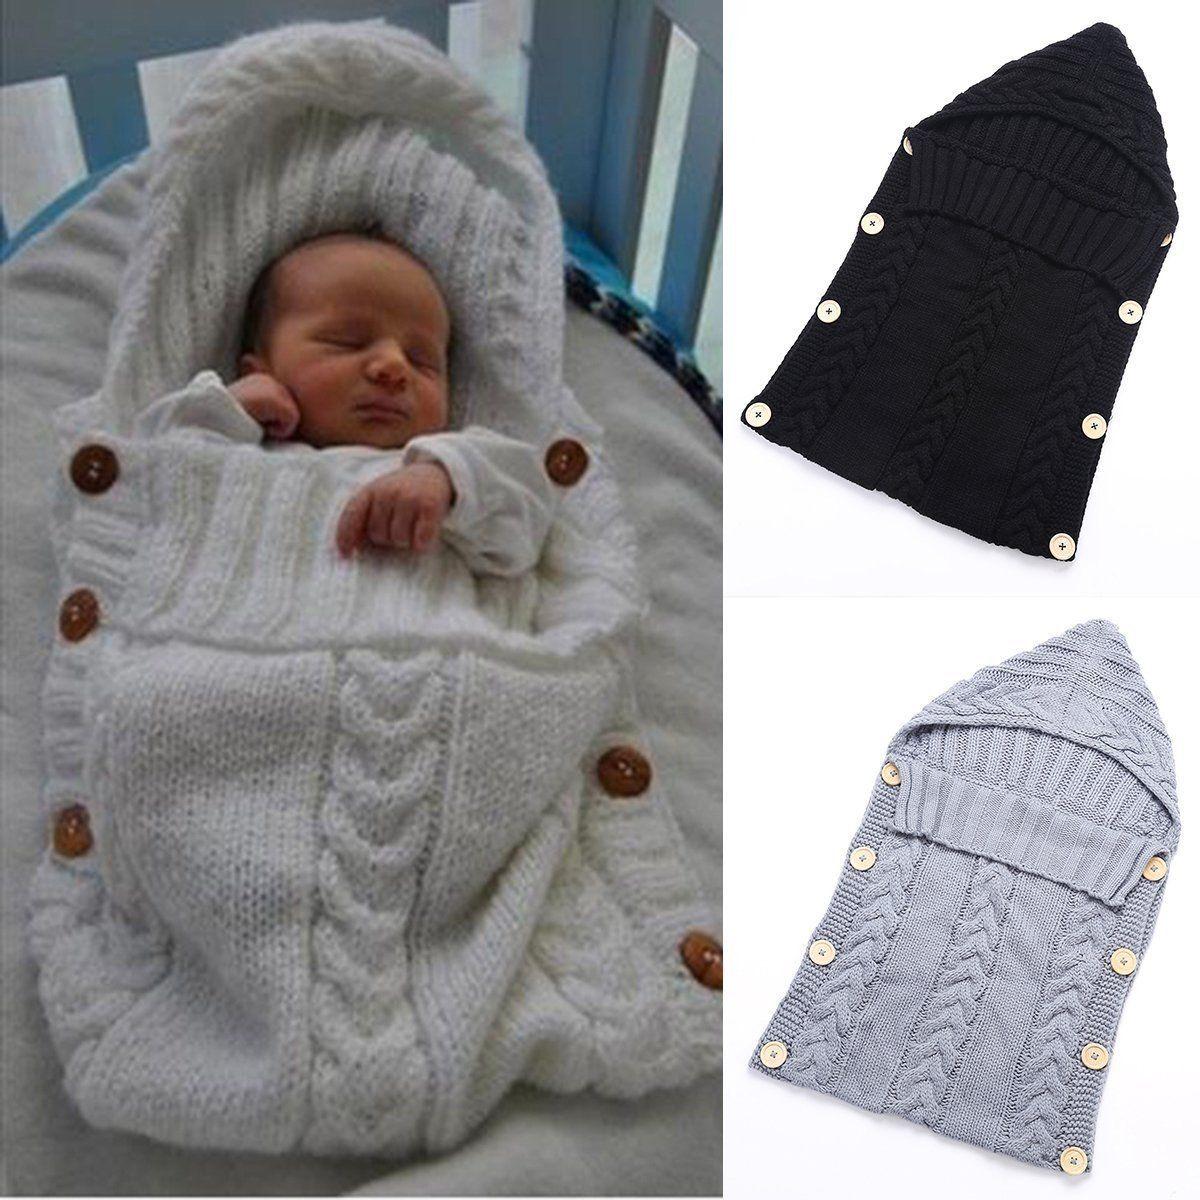 Newborn Baby Blanket Knit Crochet Swaddle Sleeping Bag Stroller Wrap Sleep sacks